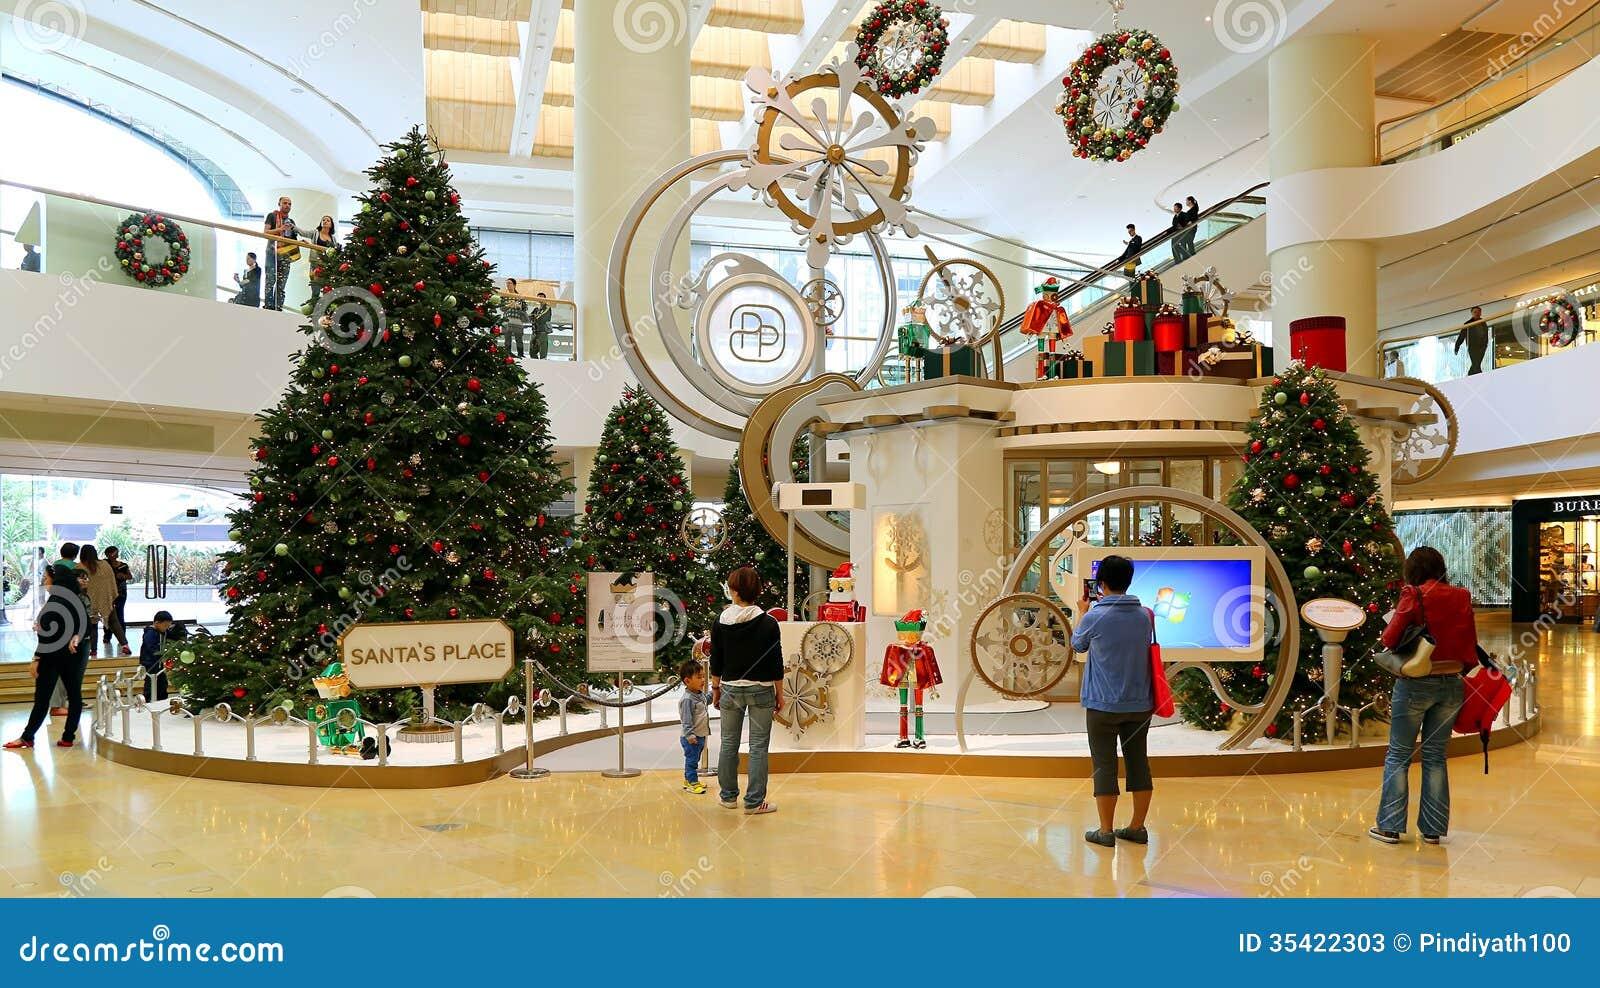 Decorating Ideas > Christmas Decoration Shopping  Ideas Christmas Decorating ~ 123946_Christmas Decoration Ideas Mall